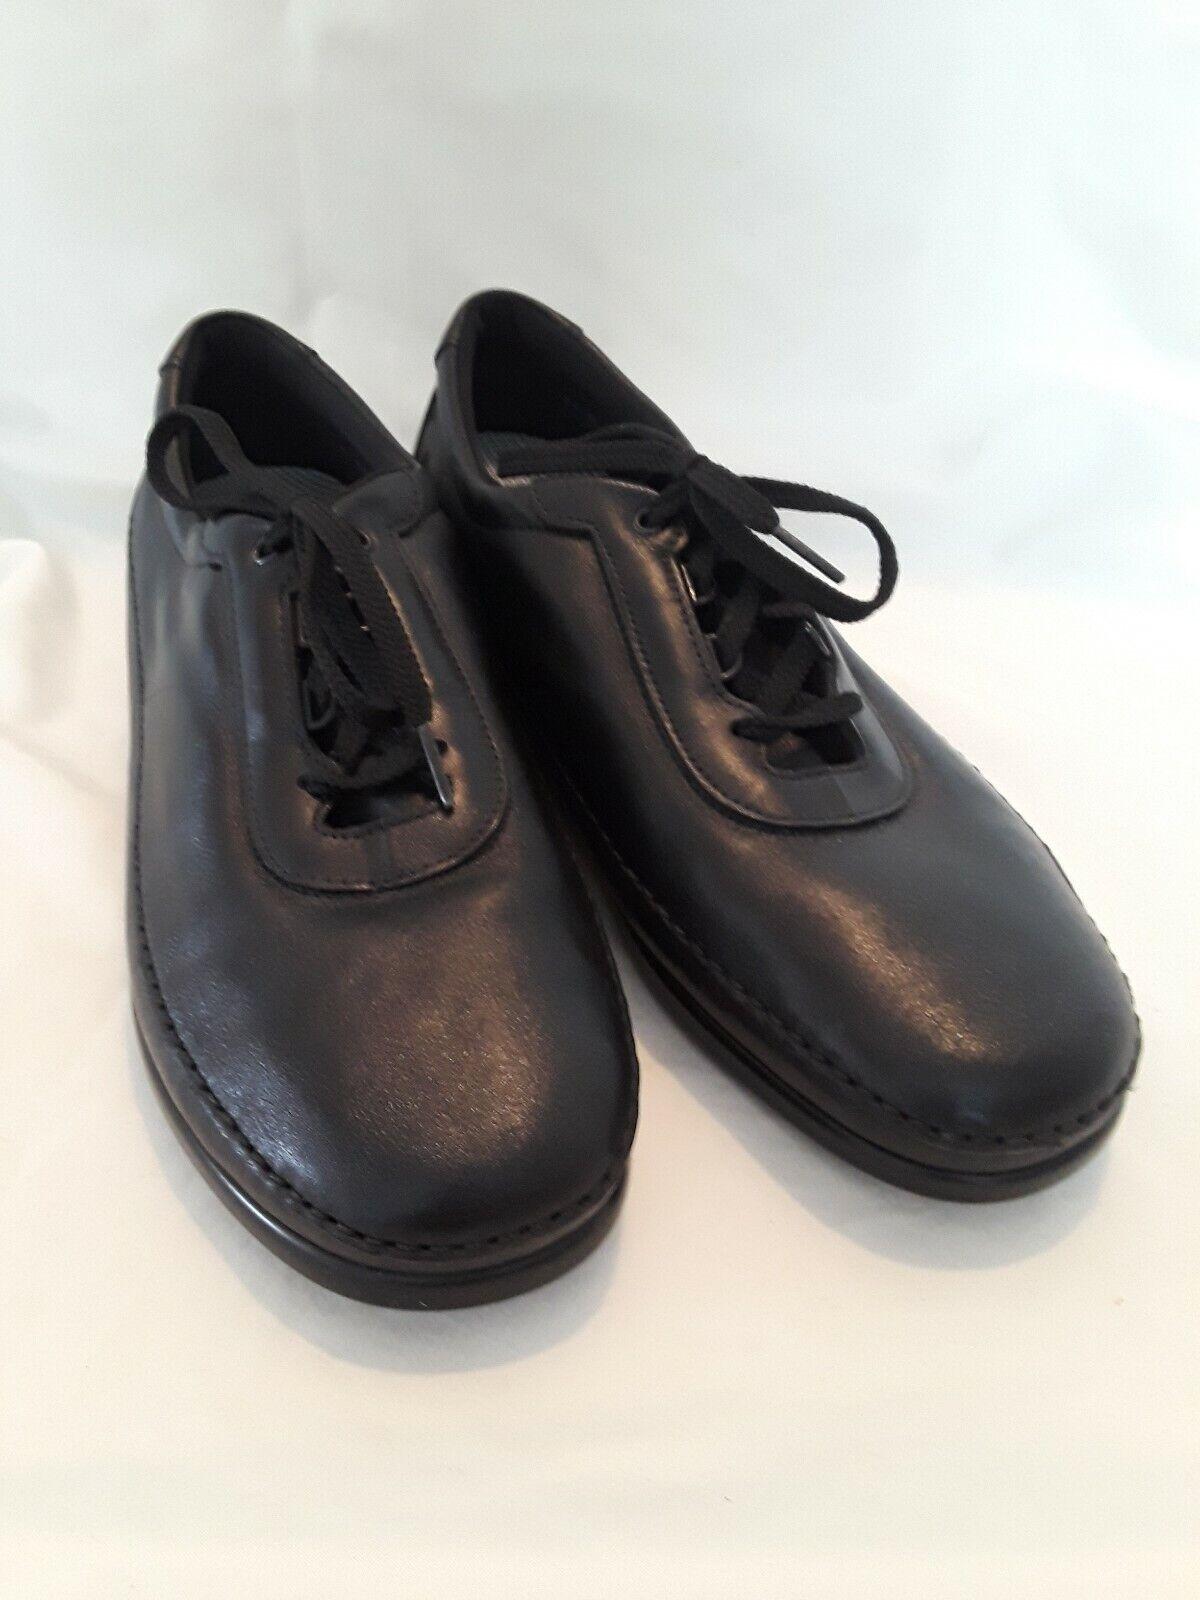 SAS Traveler Black Womens Lace Up Tripad Tripad Tripad Comfort shoes Leather Made USA 11 M fdc350